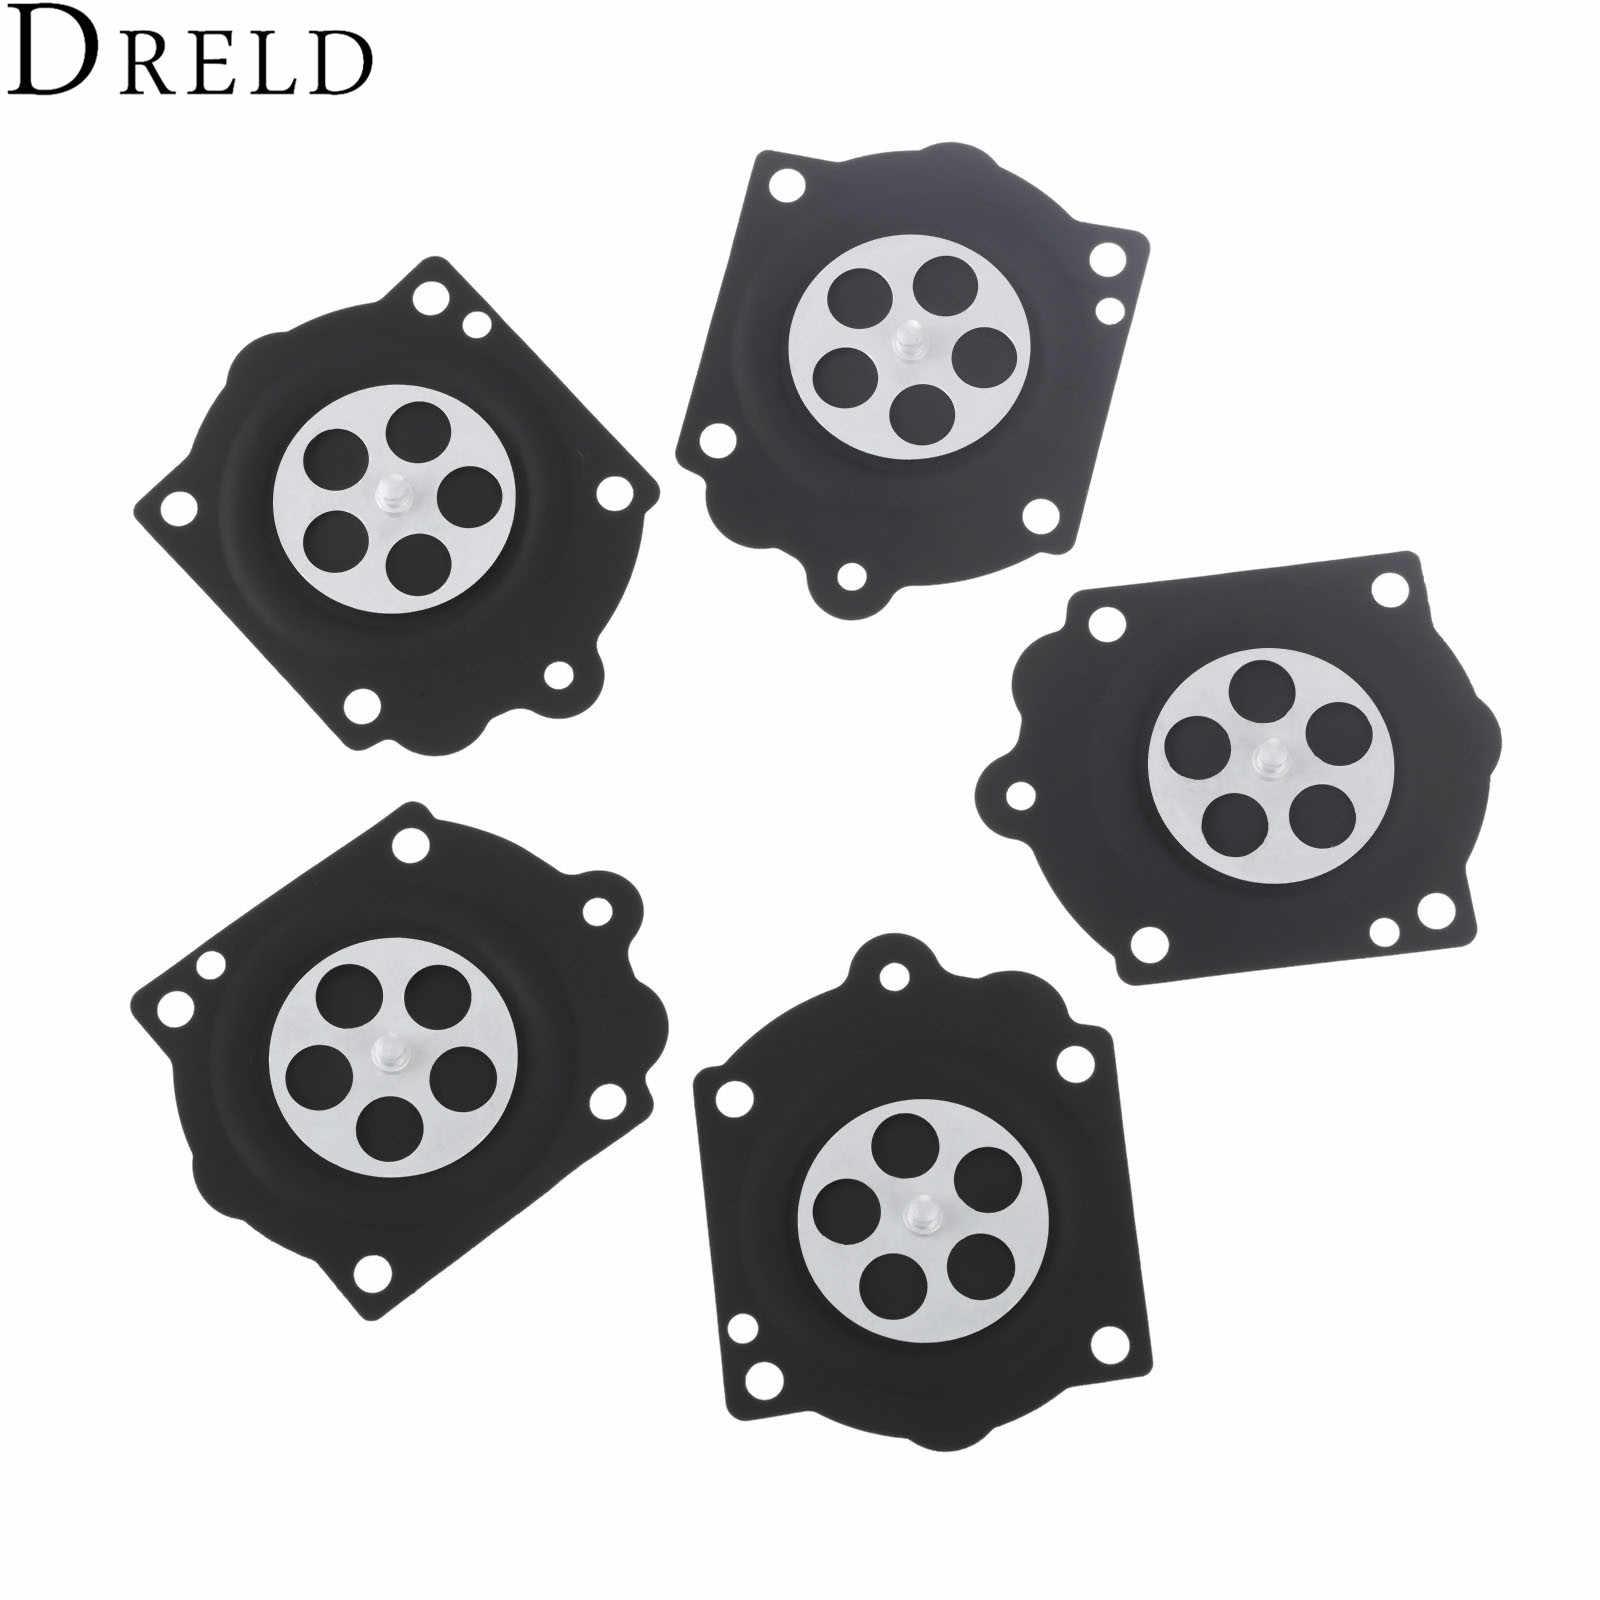 dreld 5pcs carburetor carb rebuild metering diaphragm kit for walbro hdb wg mcculloch pro mac 610 [ 1600 x 1600 Pixel ]